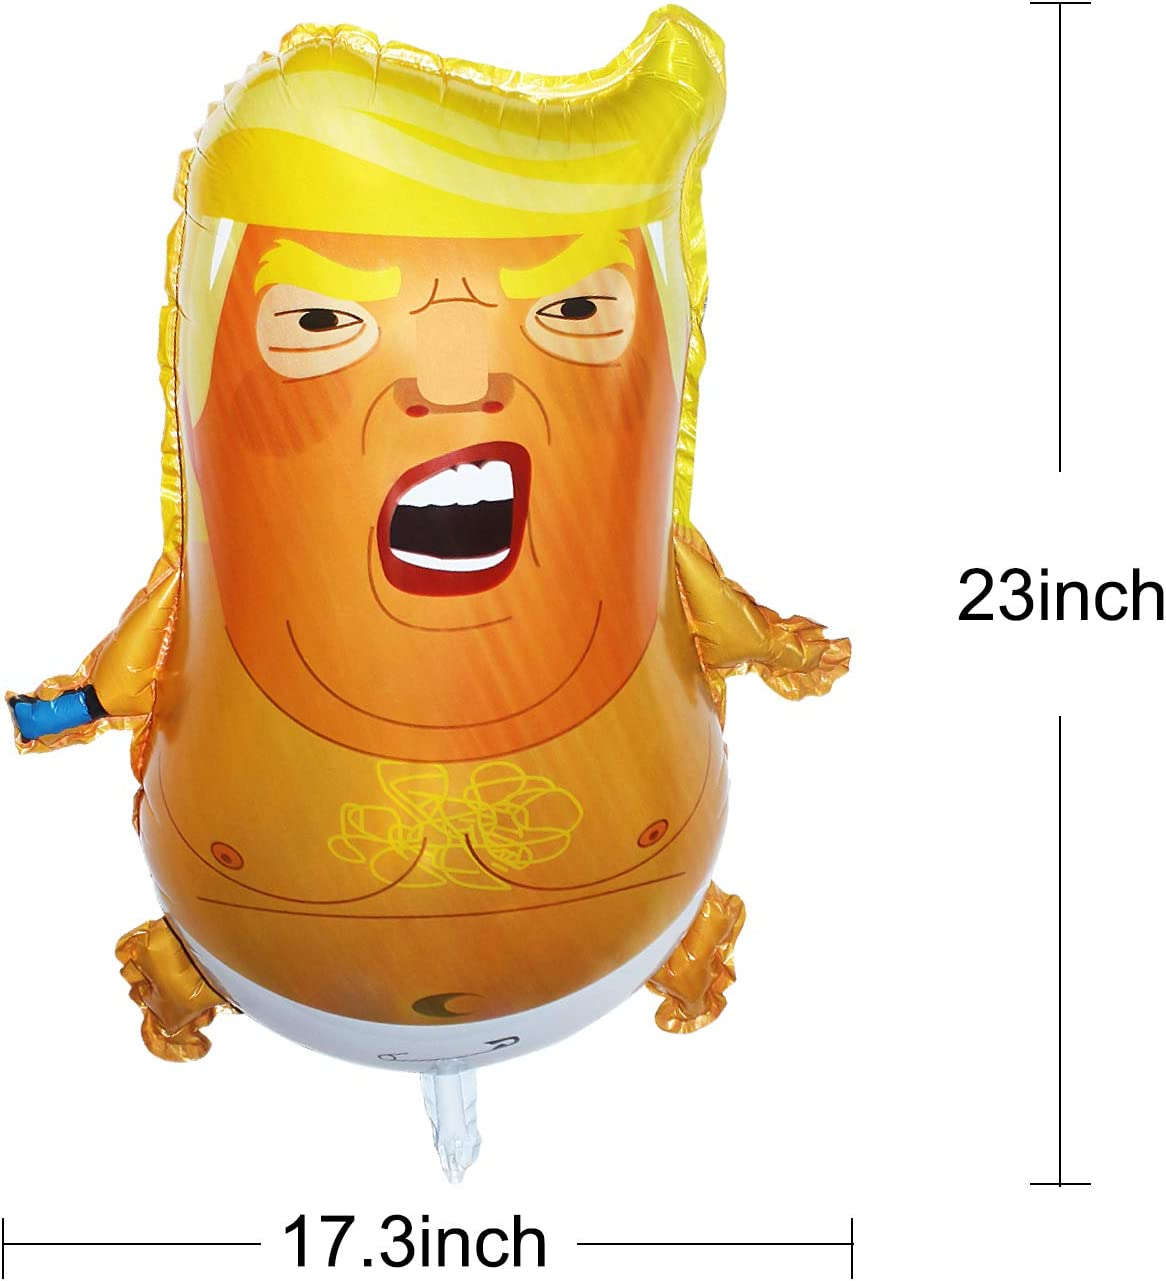 22 x 17inch Funny Trump Baby Balloon Cartoon Donald Trump Party Foil Balloon